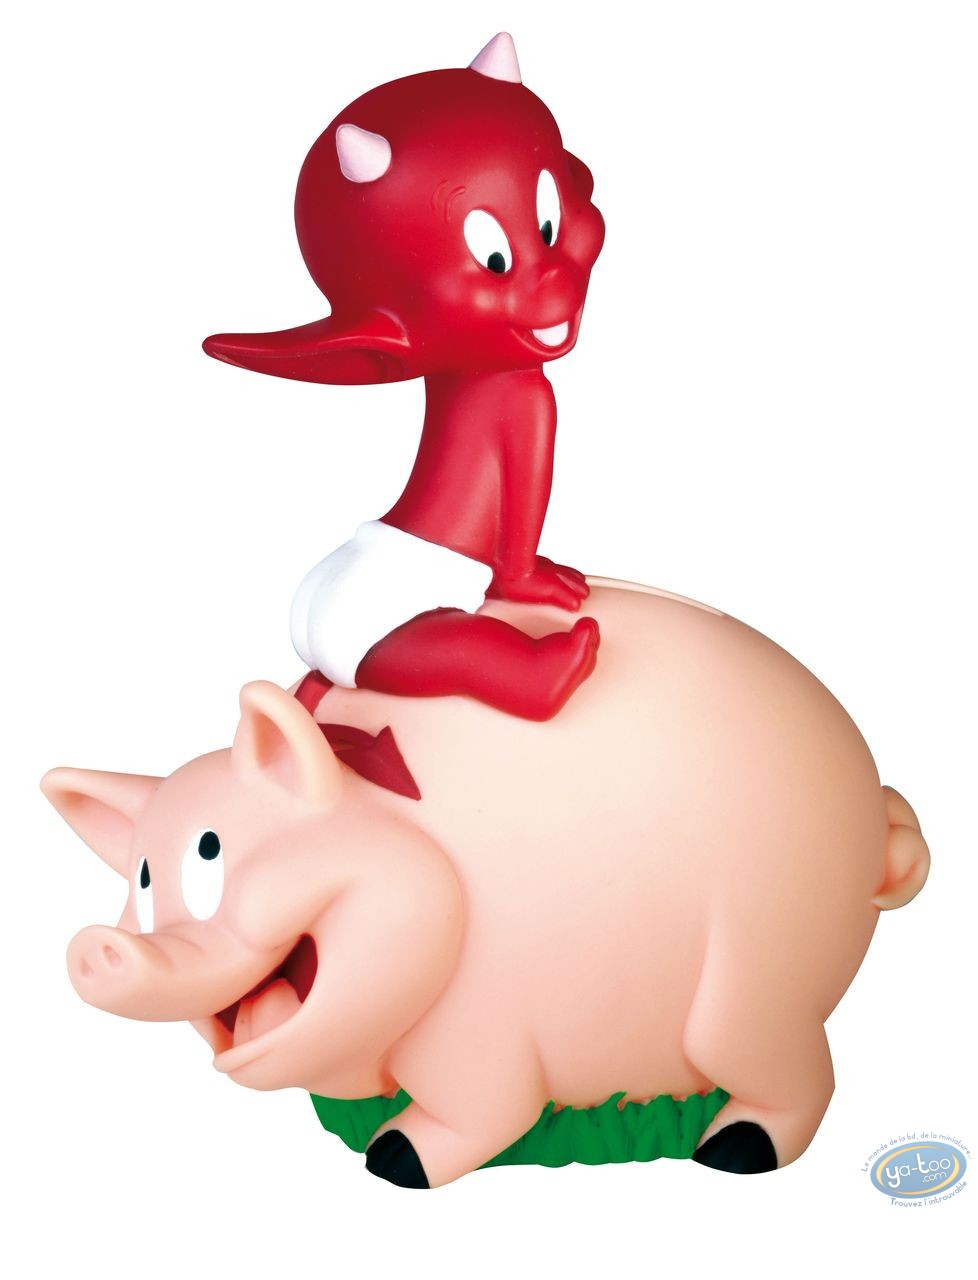 Piggy Bank, Hot Stuff : Money box, Hot Stuff